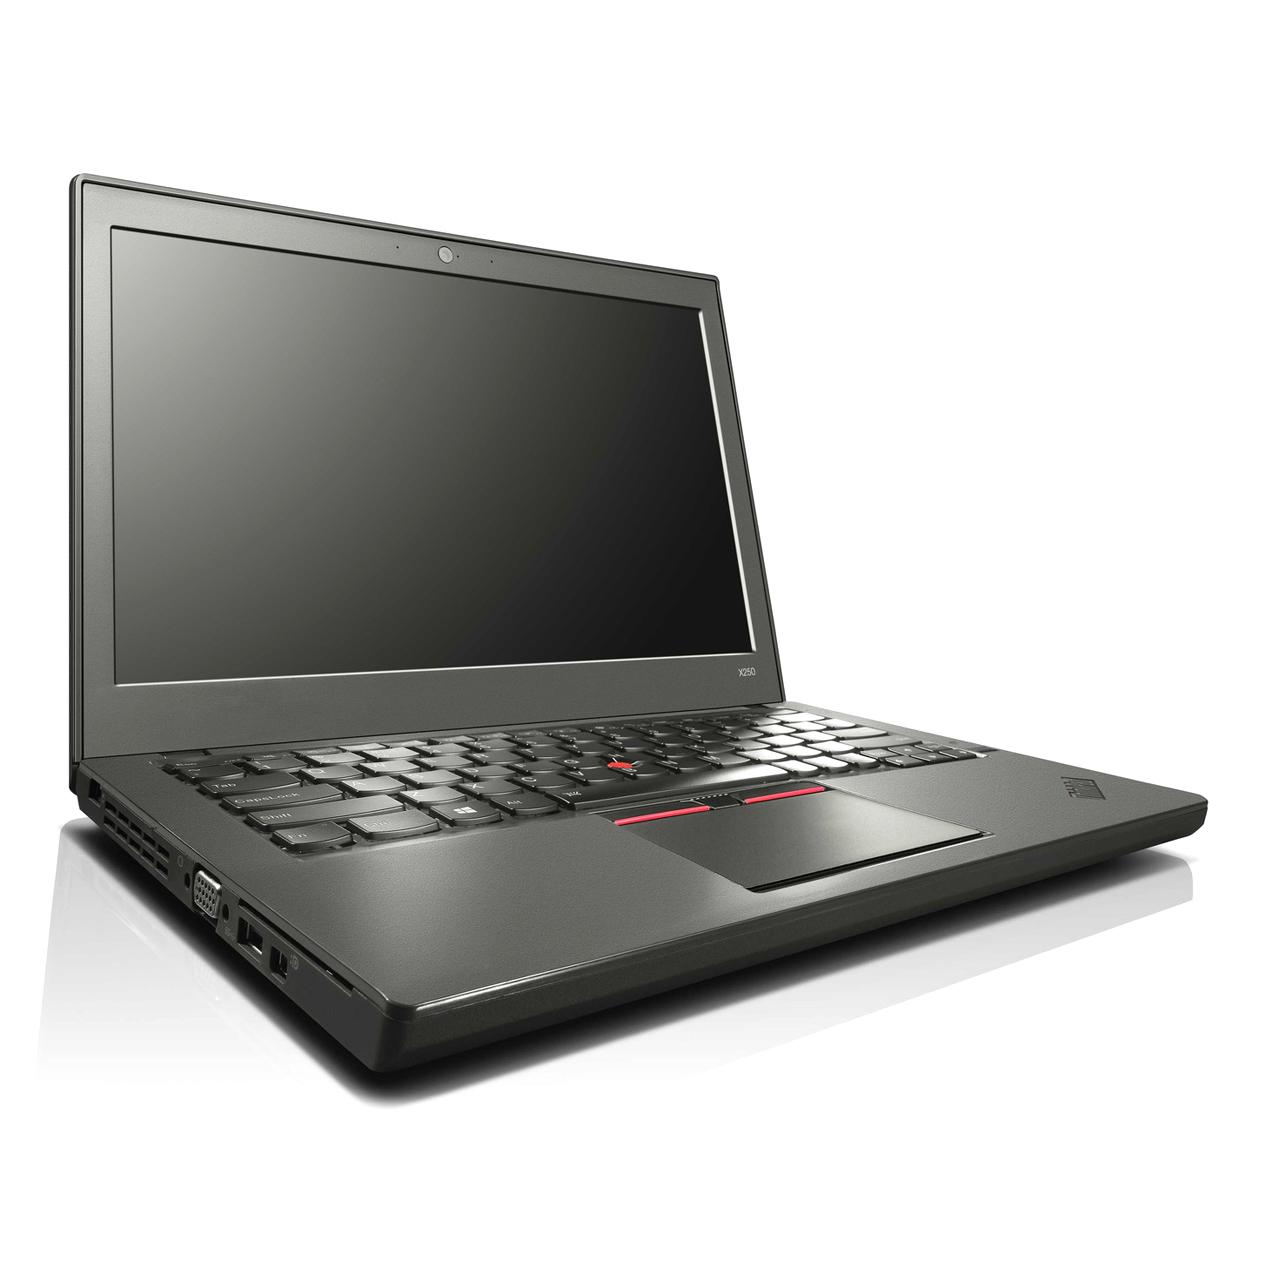 Lenovo Thinkpad X250 12.5-inch (2015) - Core i5-5300U - 8GB - SSD 180 GB AZERTY - French